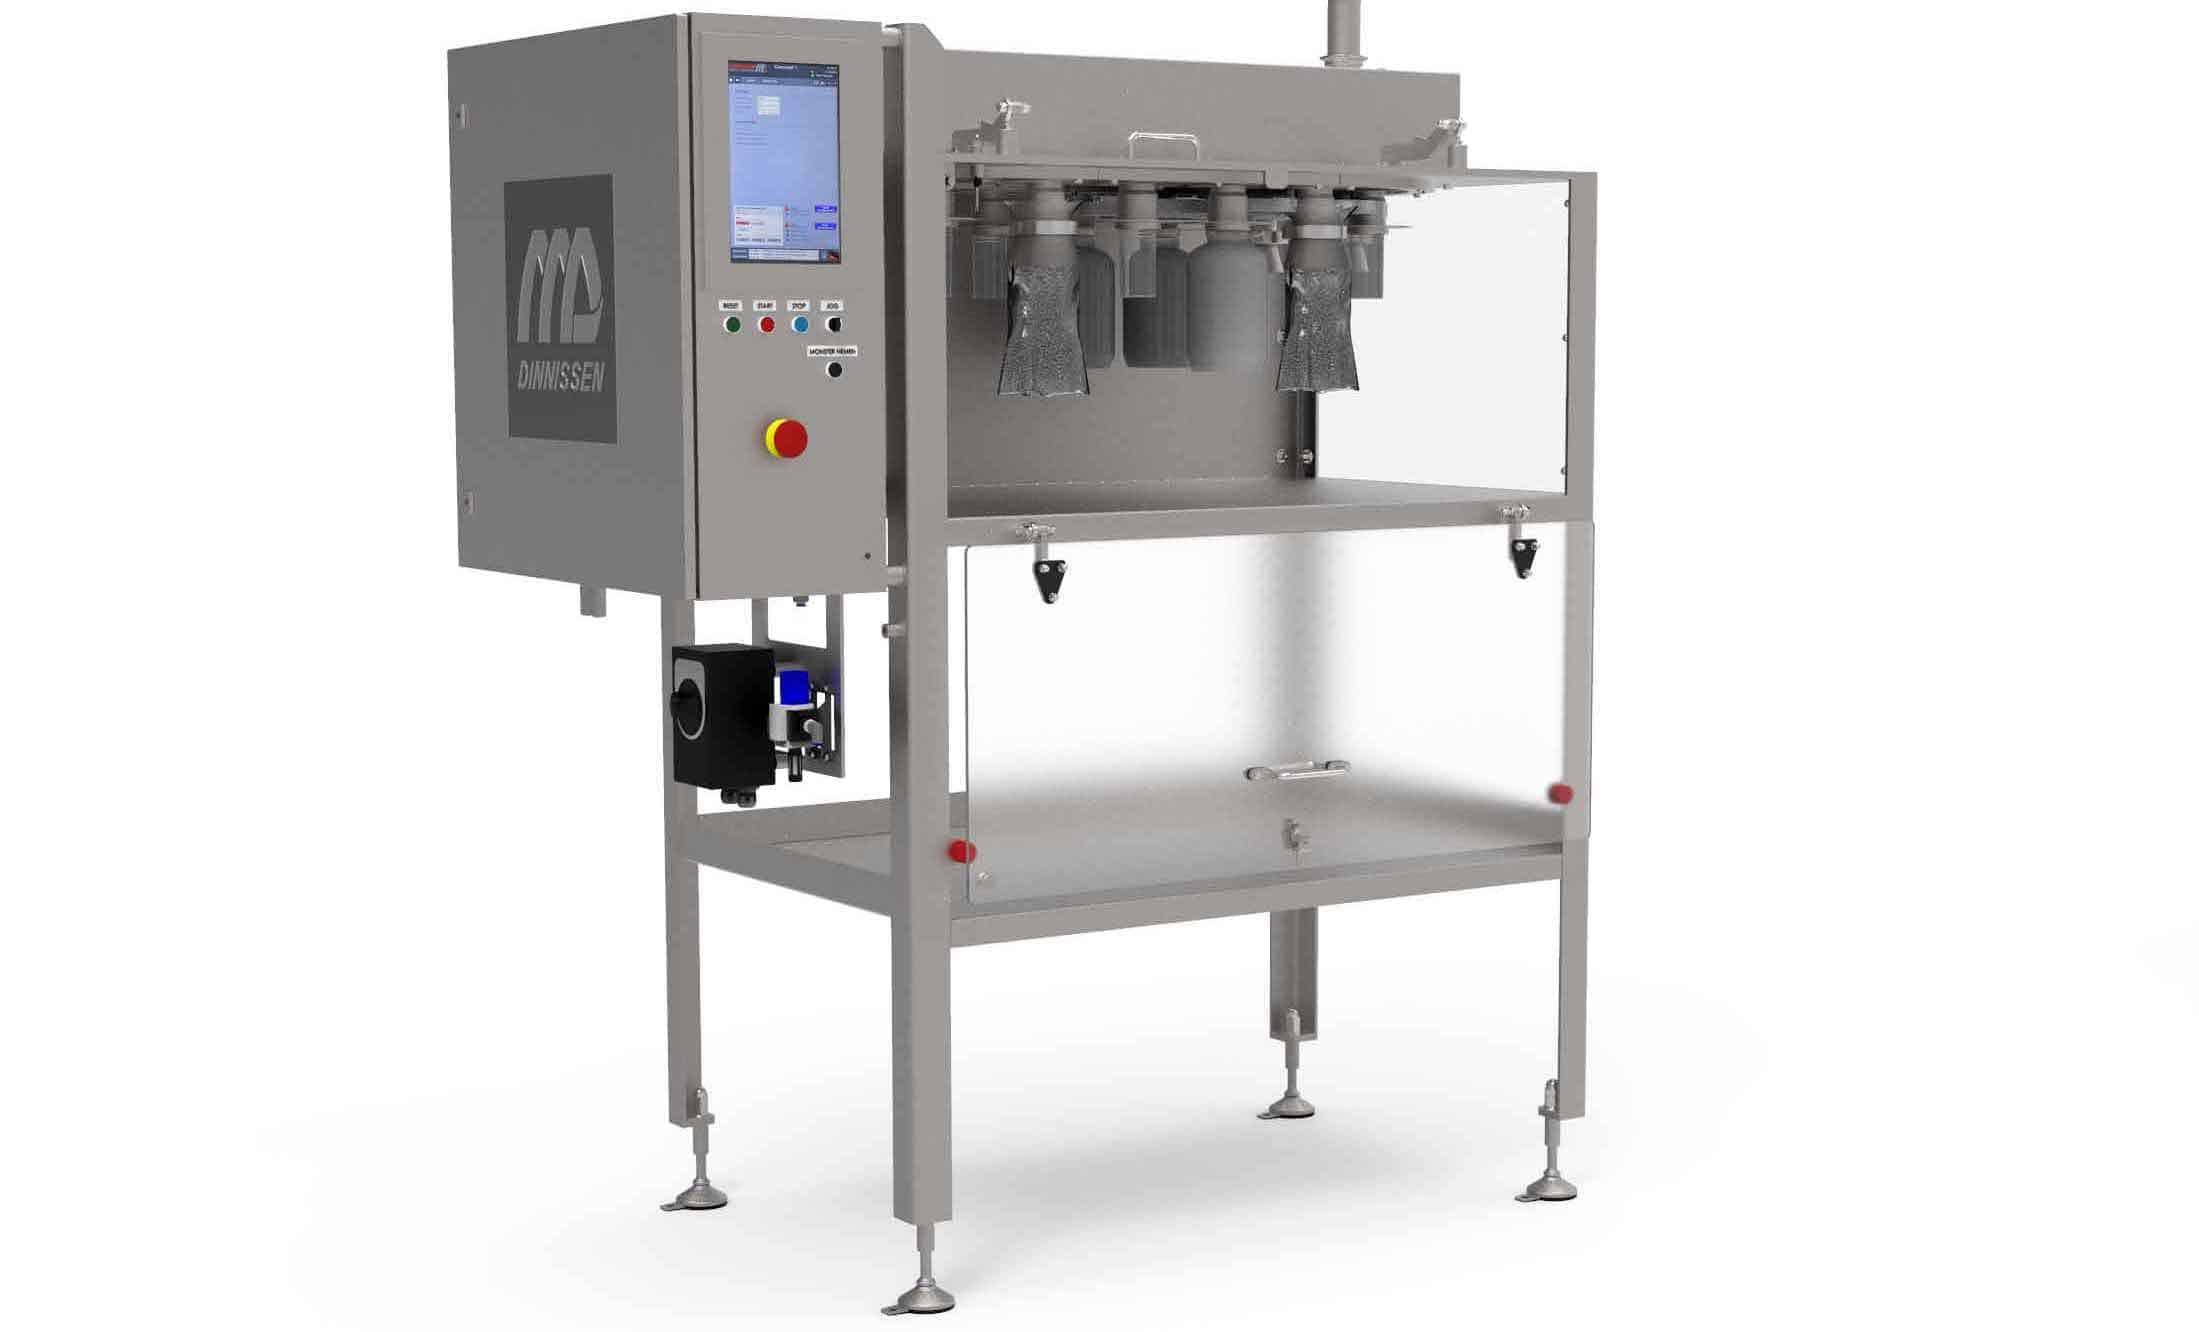 Dinnissen Process Technology Introduces New Series of Smart Sampling Systems